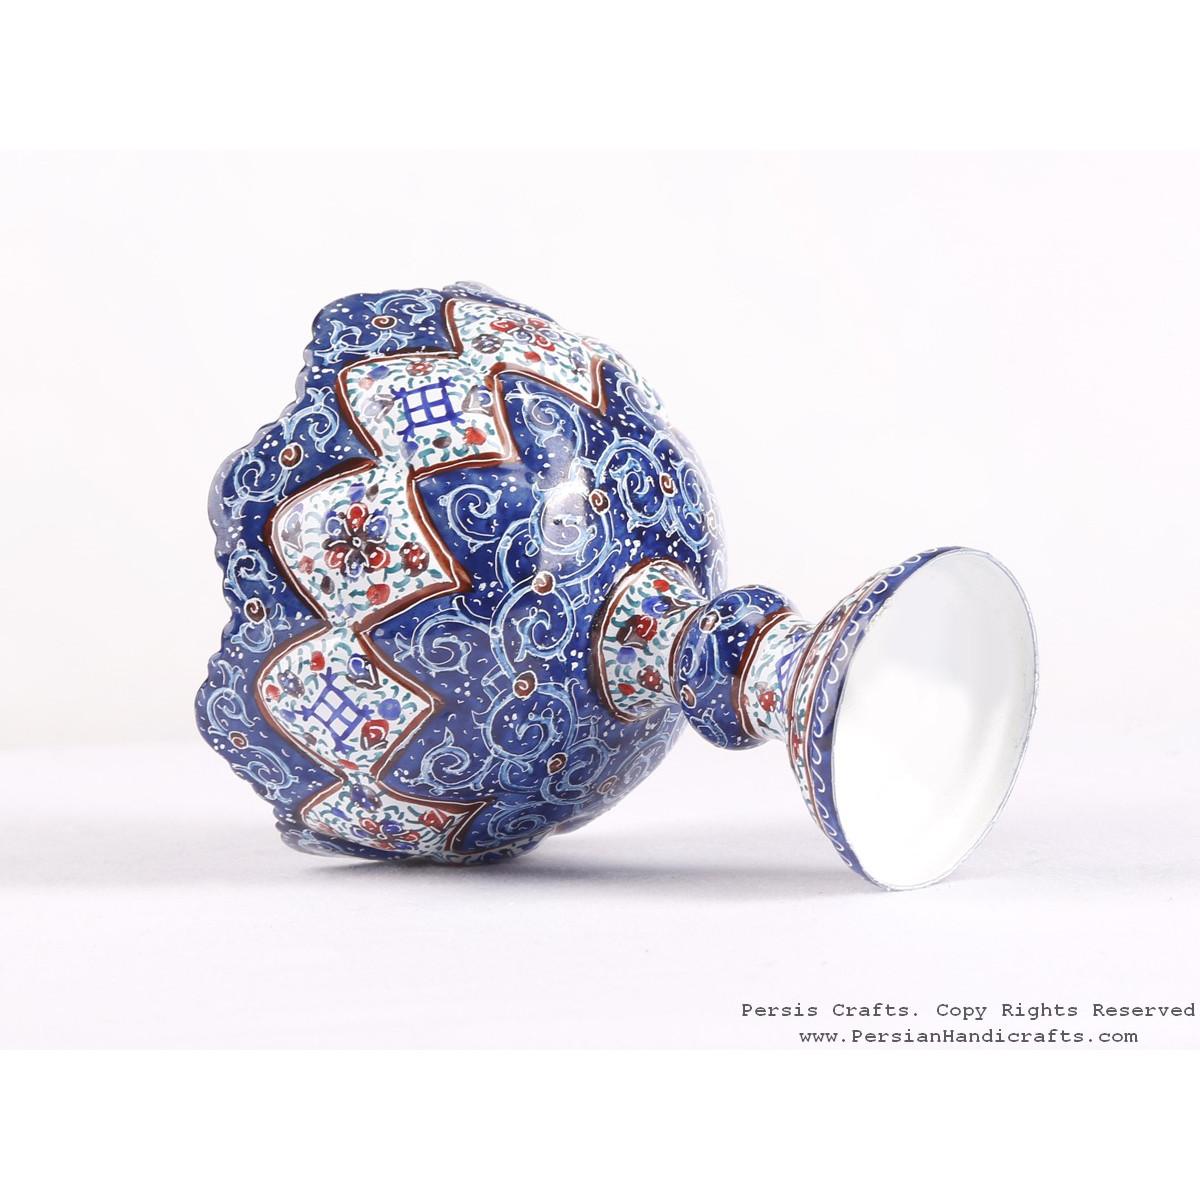 Enamel (Minakari) Pedestal Compote Candy Dish - HE3609-Persian Handicrafts